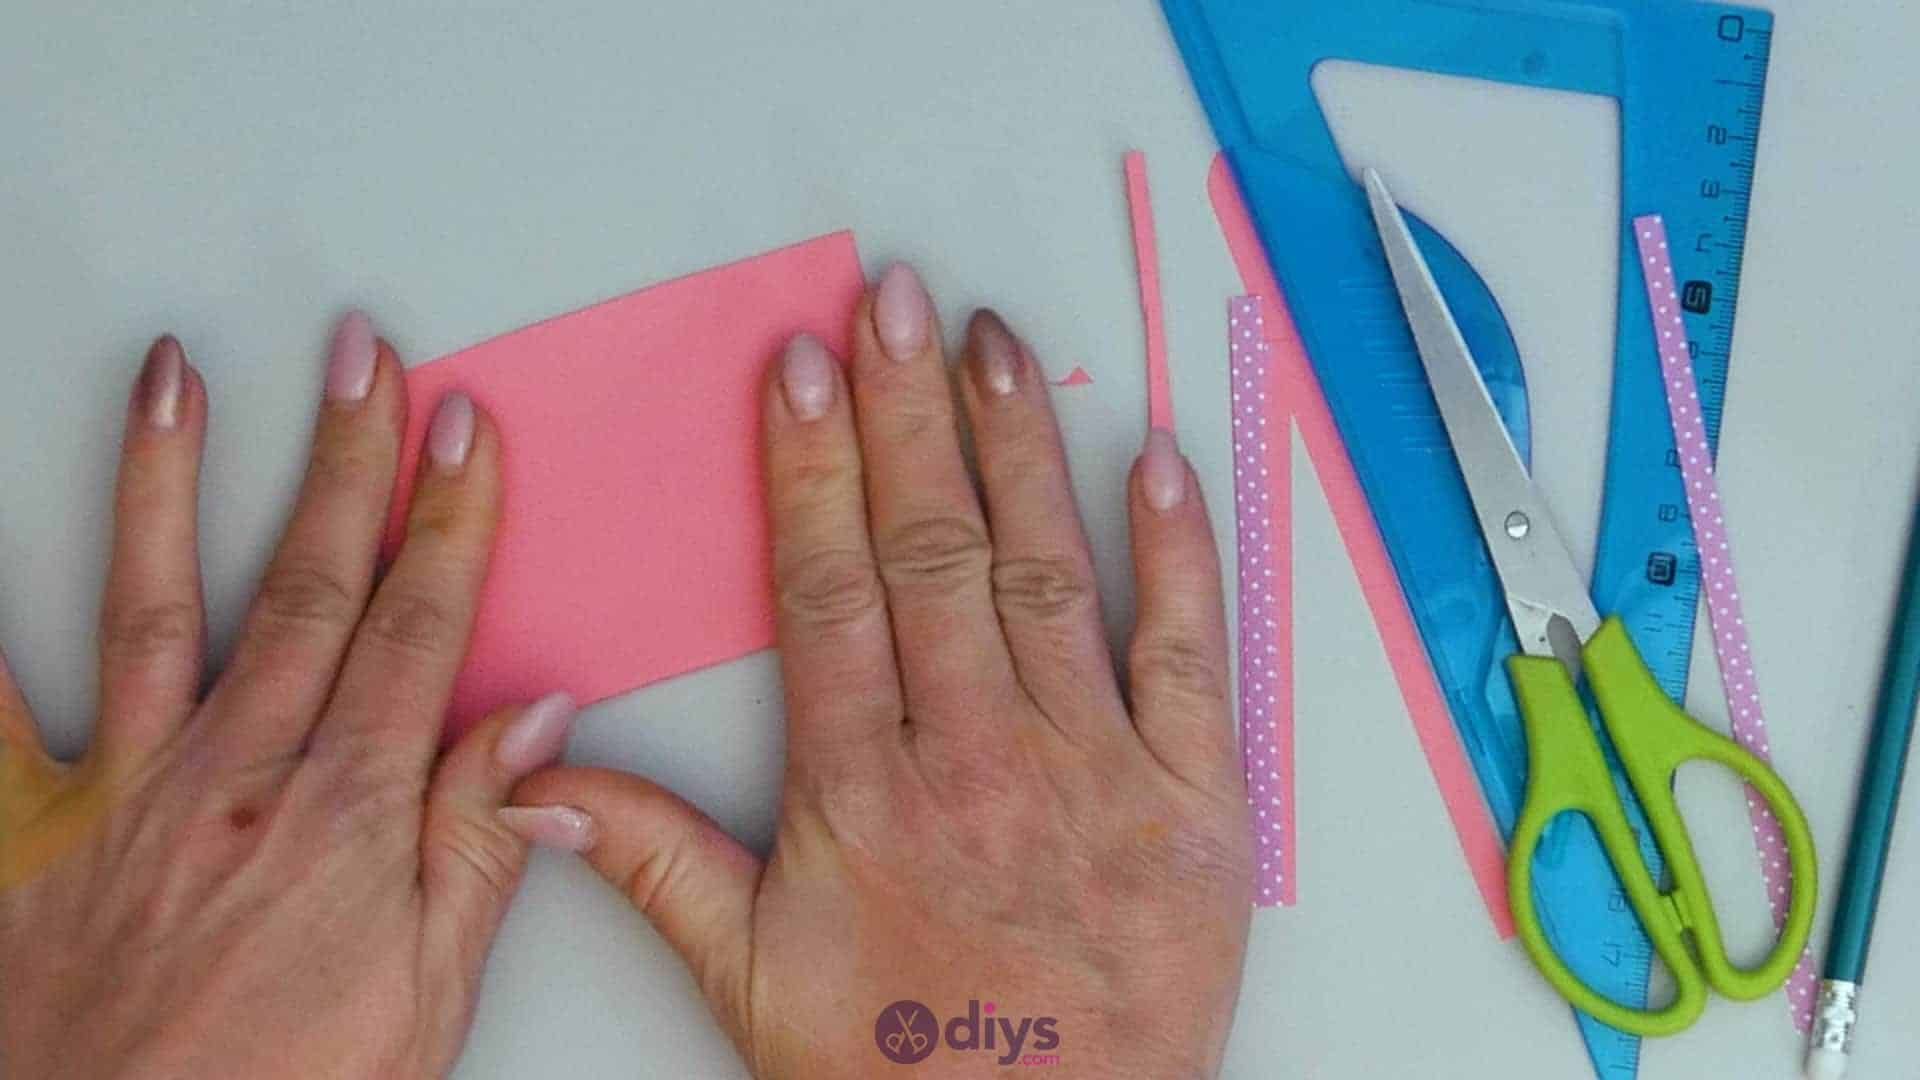 Diy lipstick gift card step 4